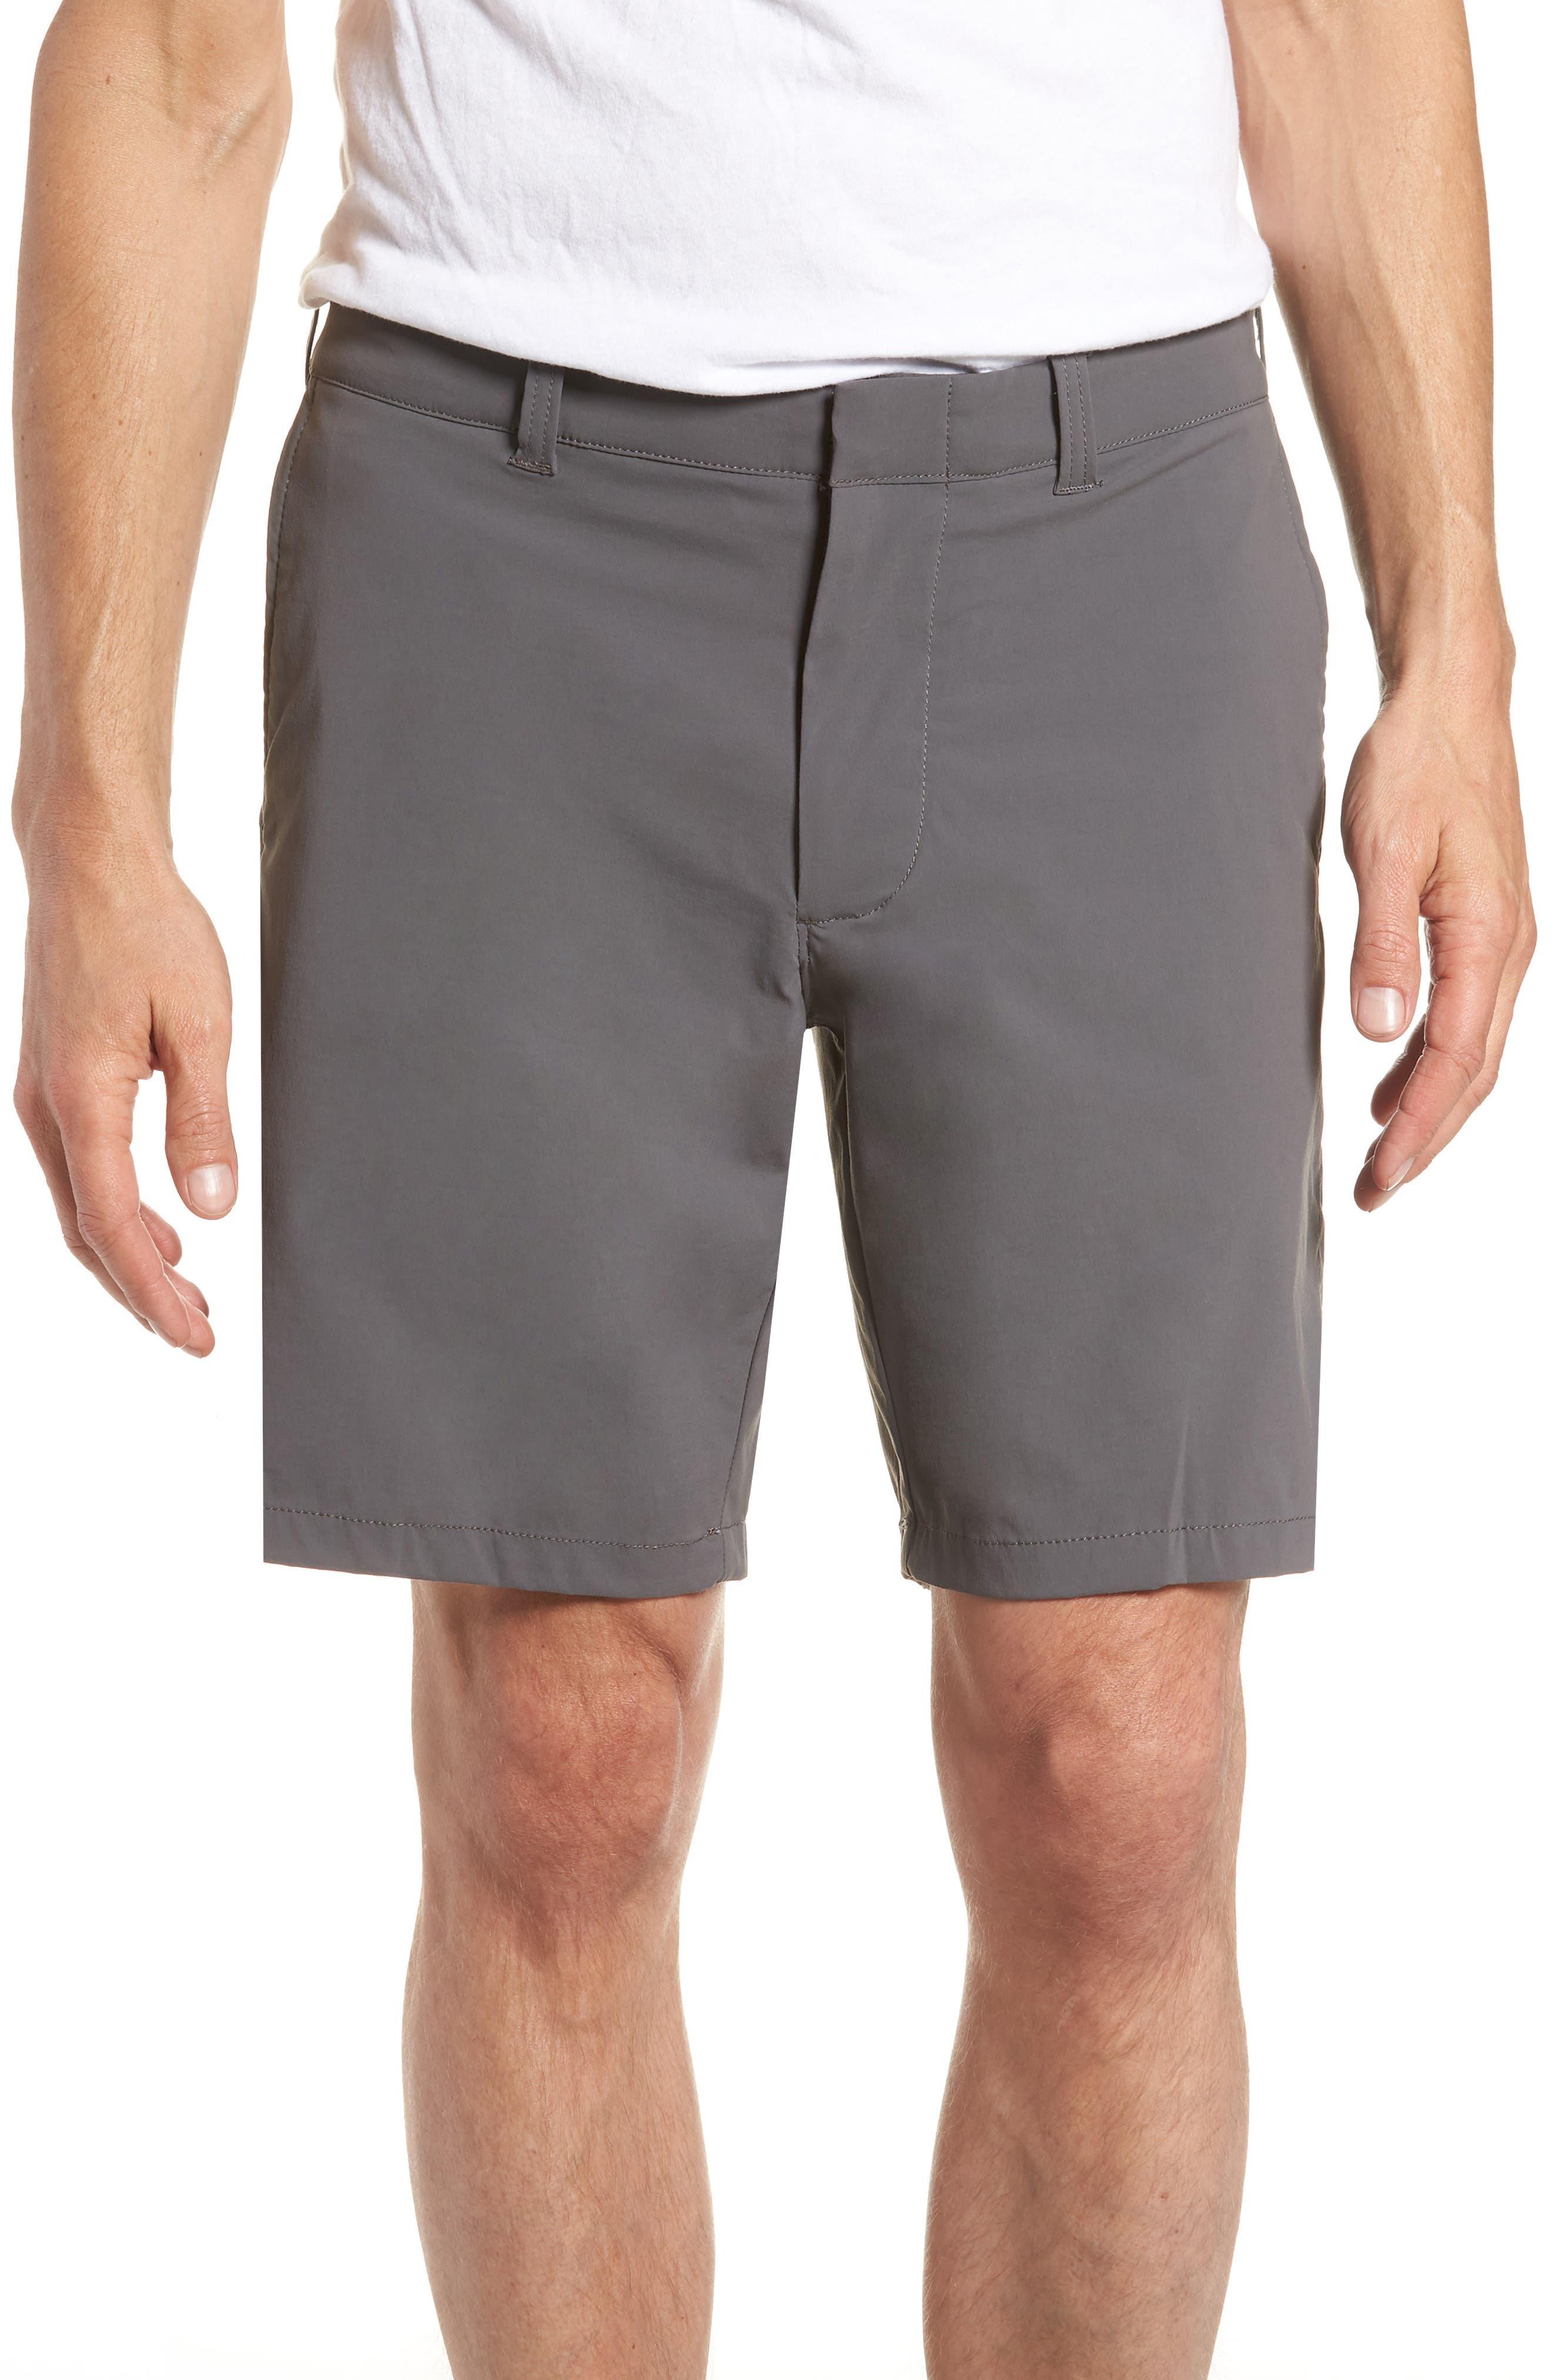 Tech Shorts,                         Main,                         color, 020